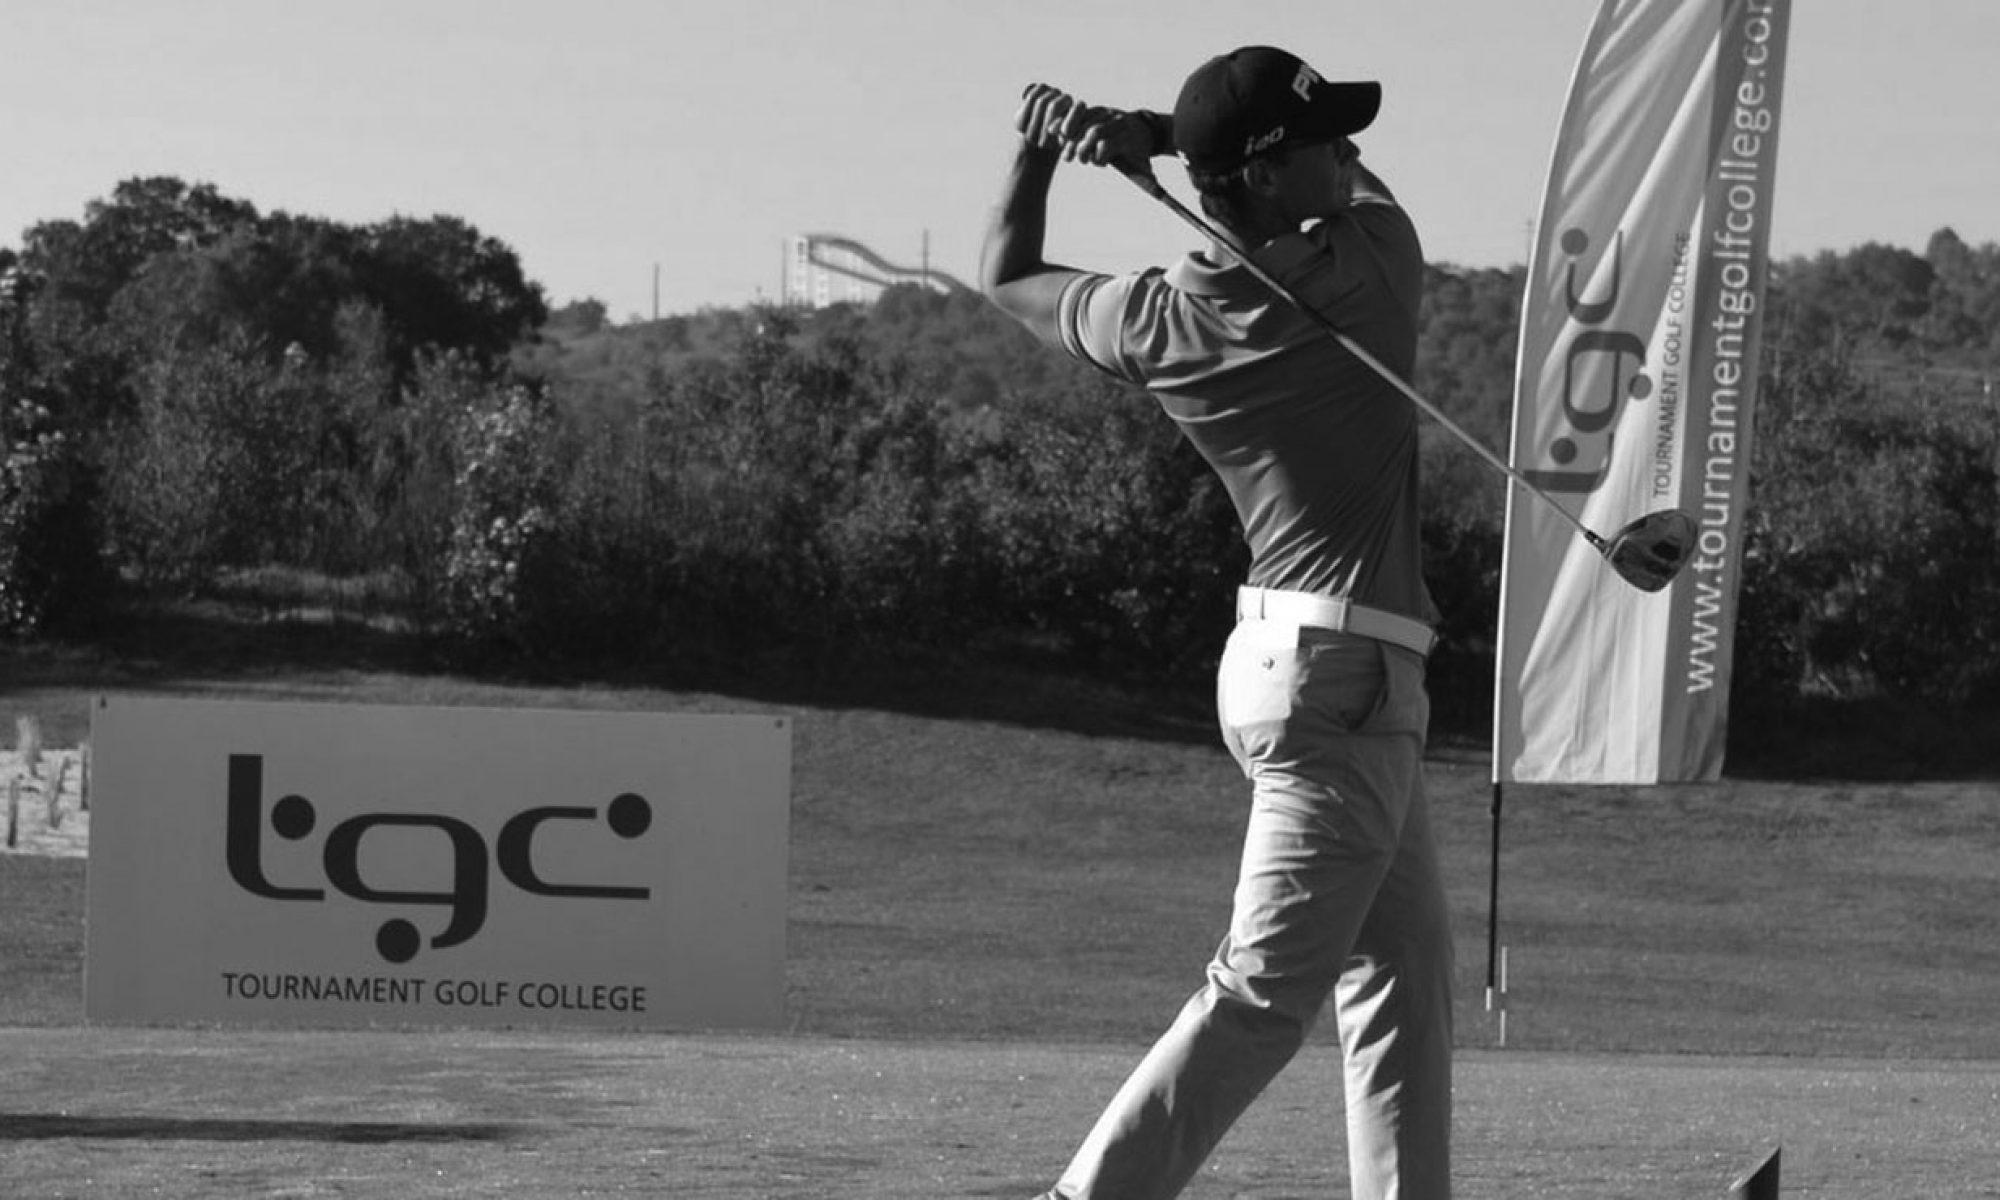 Tournament Golf College BLOG